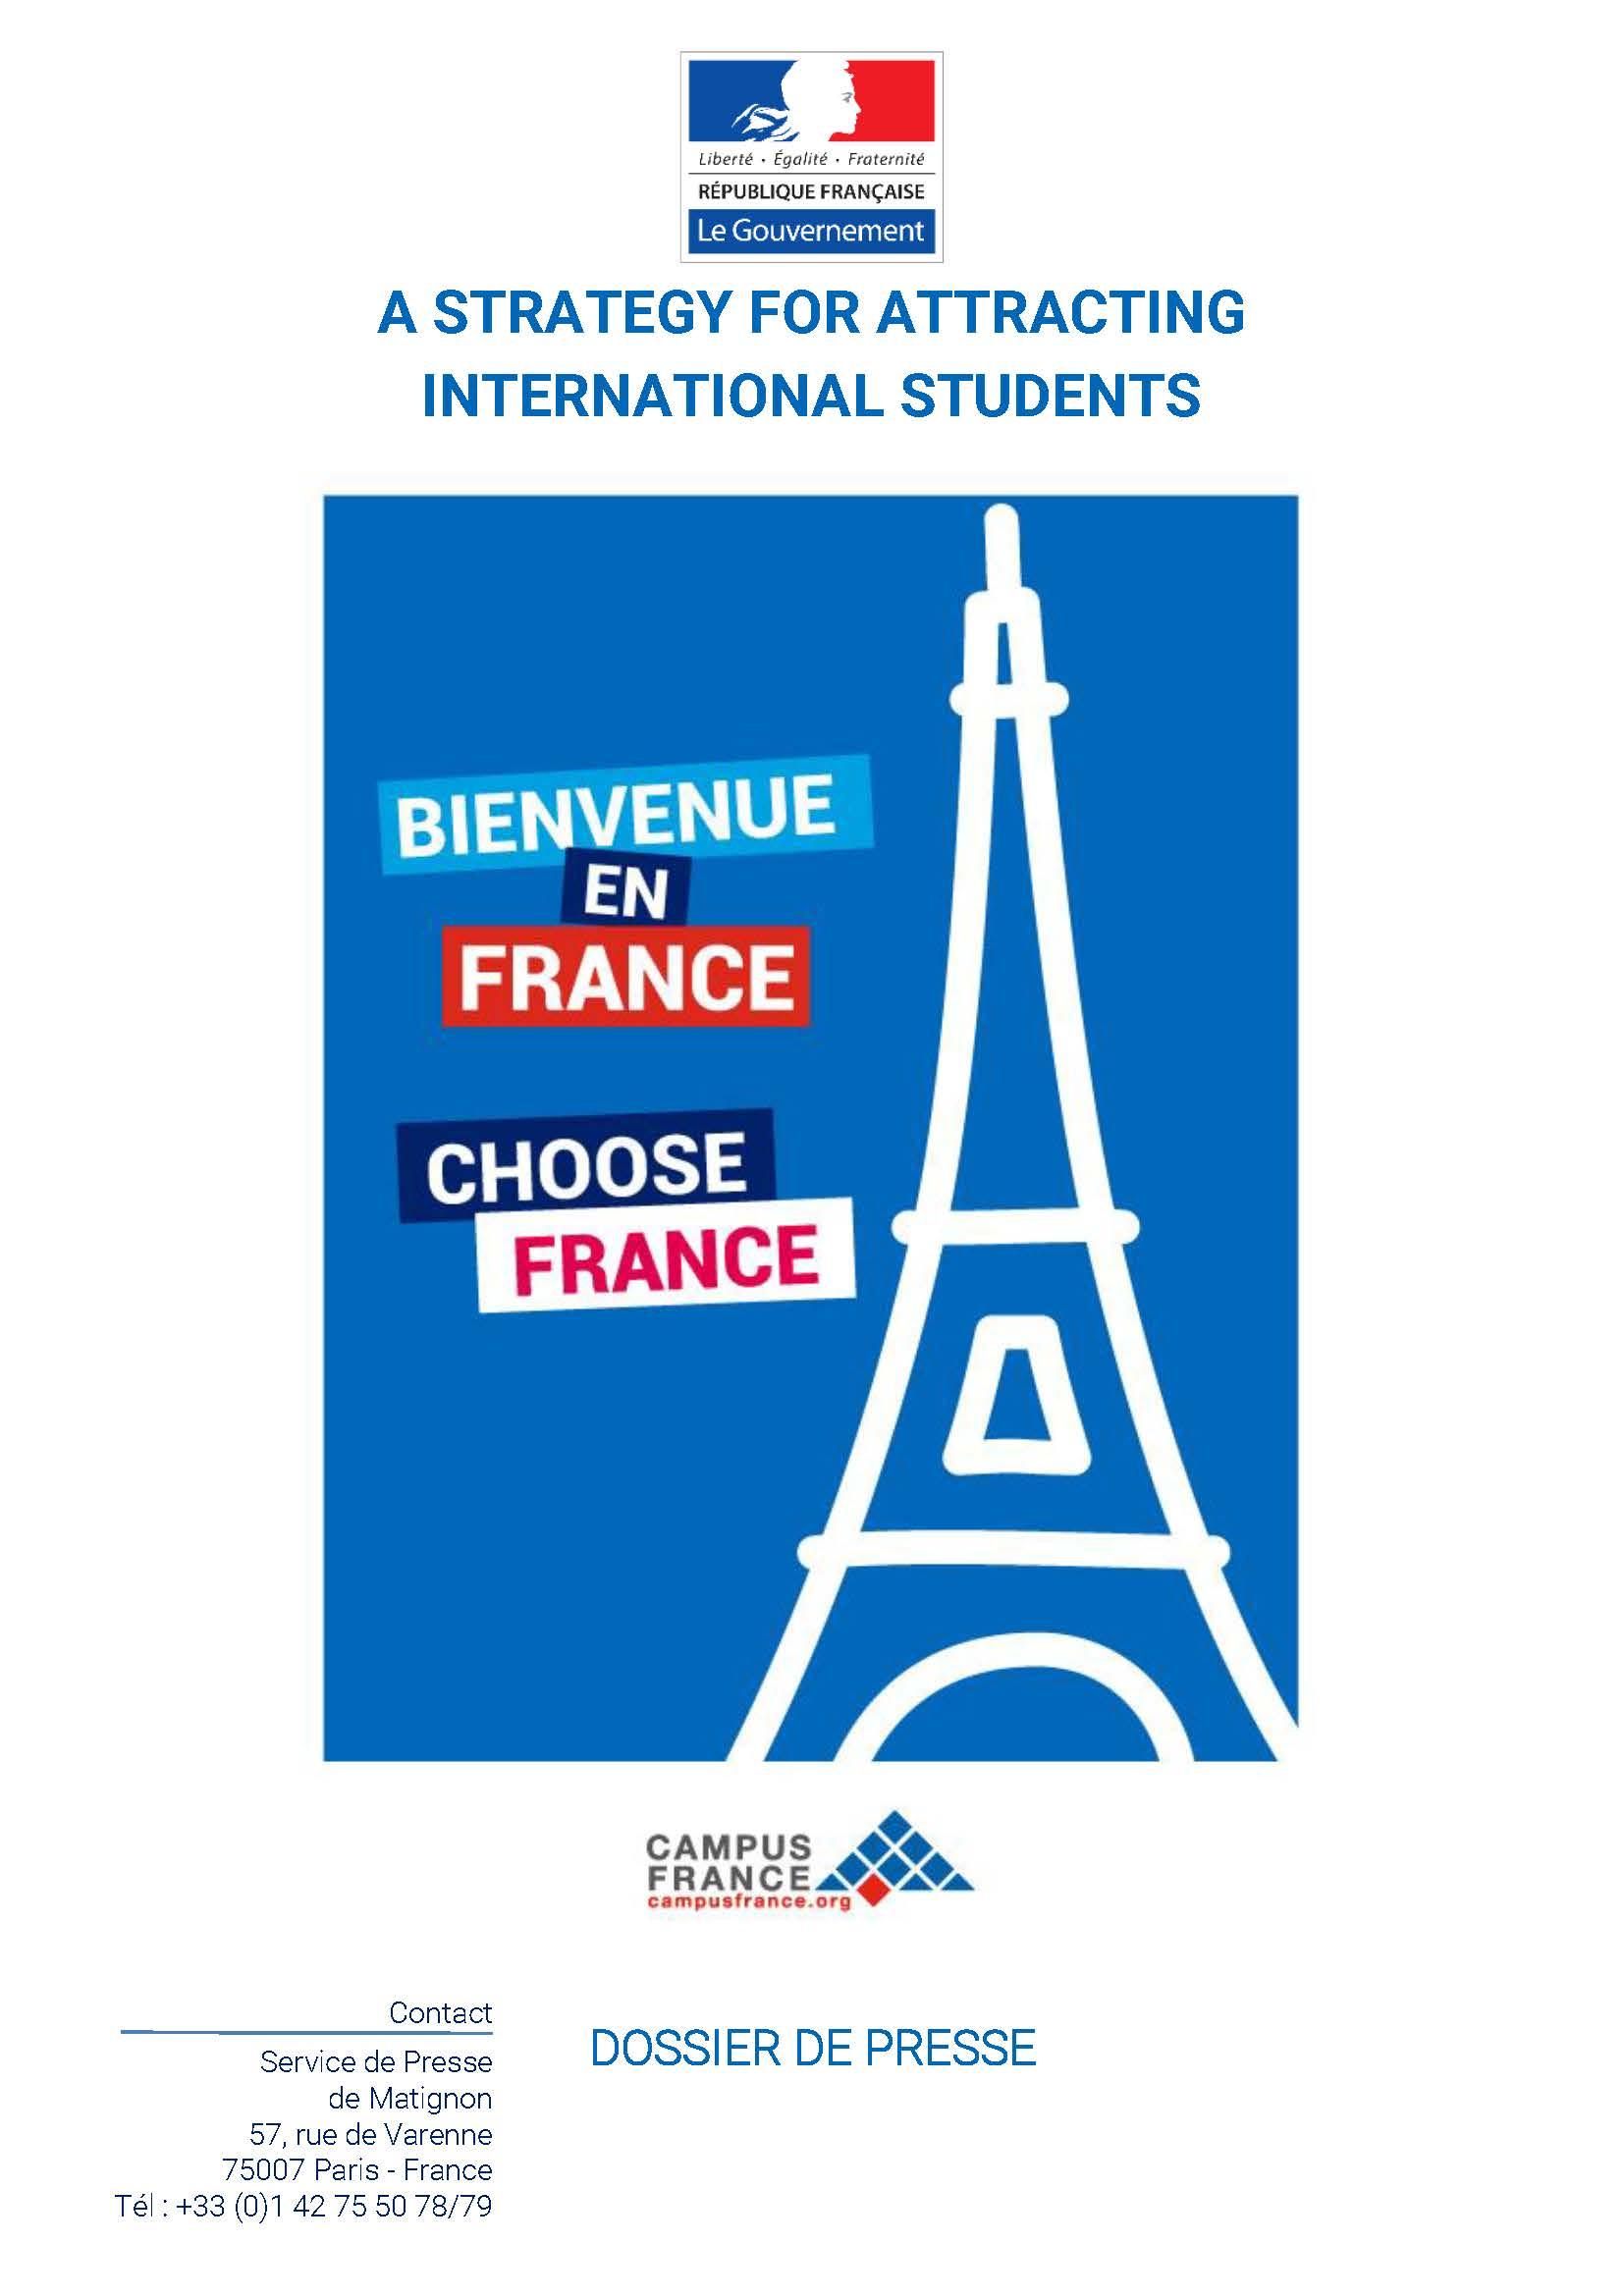 Dossier_presse_Strategie_attrate_etudiants_internationaux_en 1.jpg